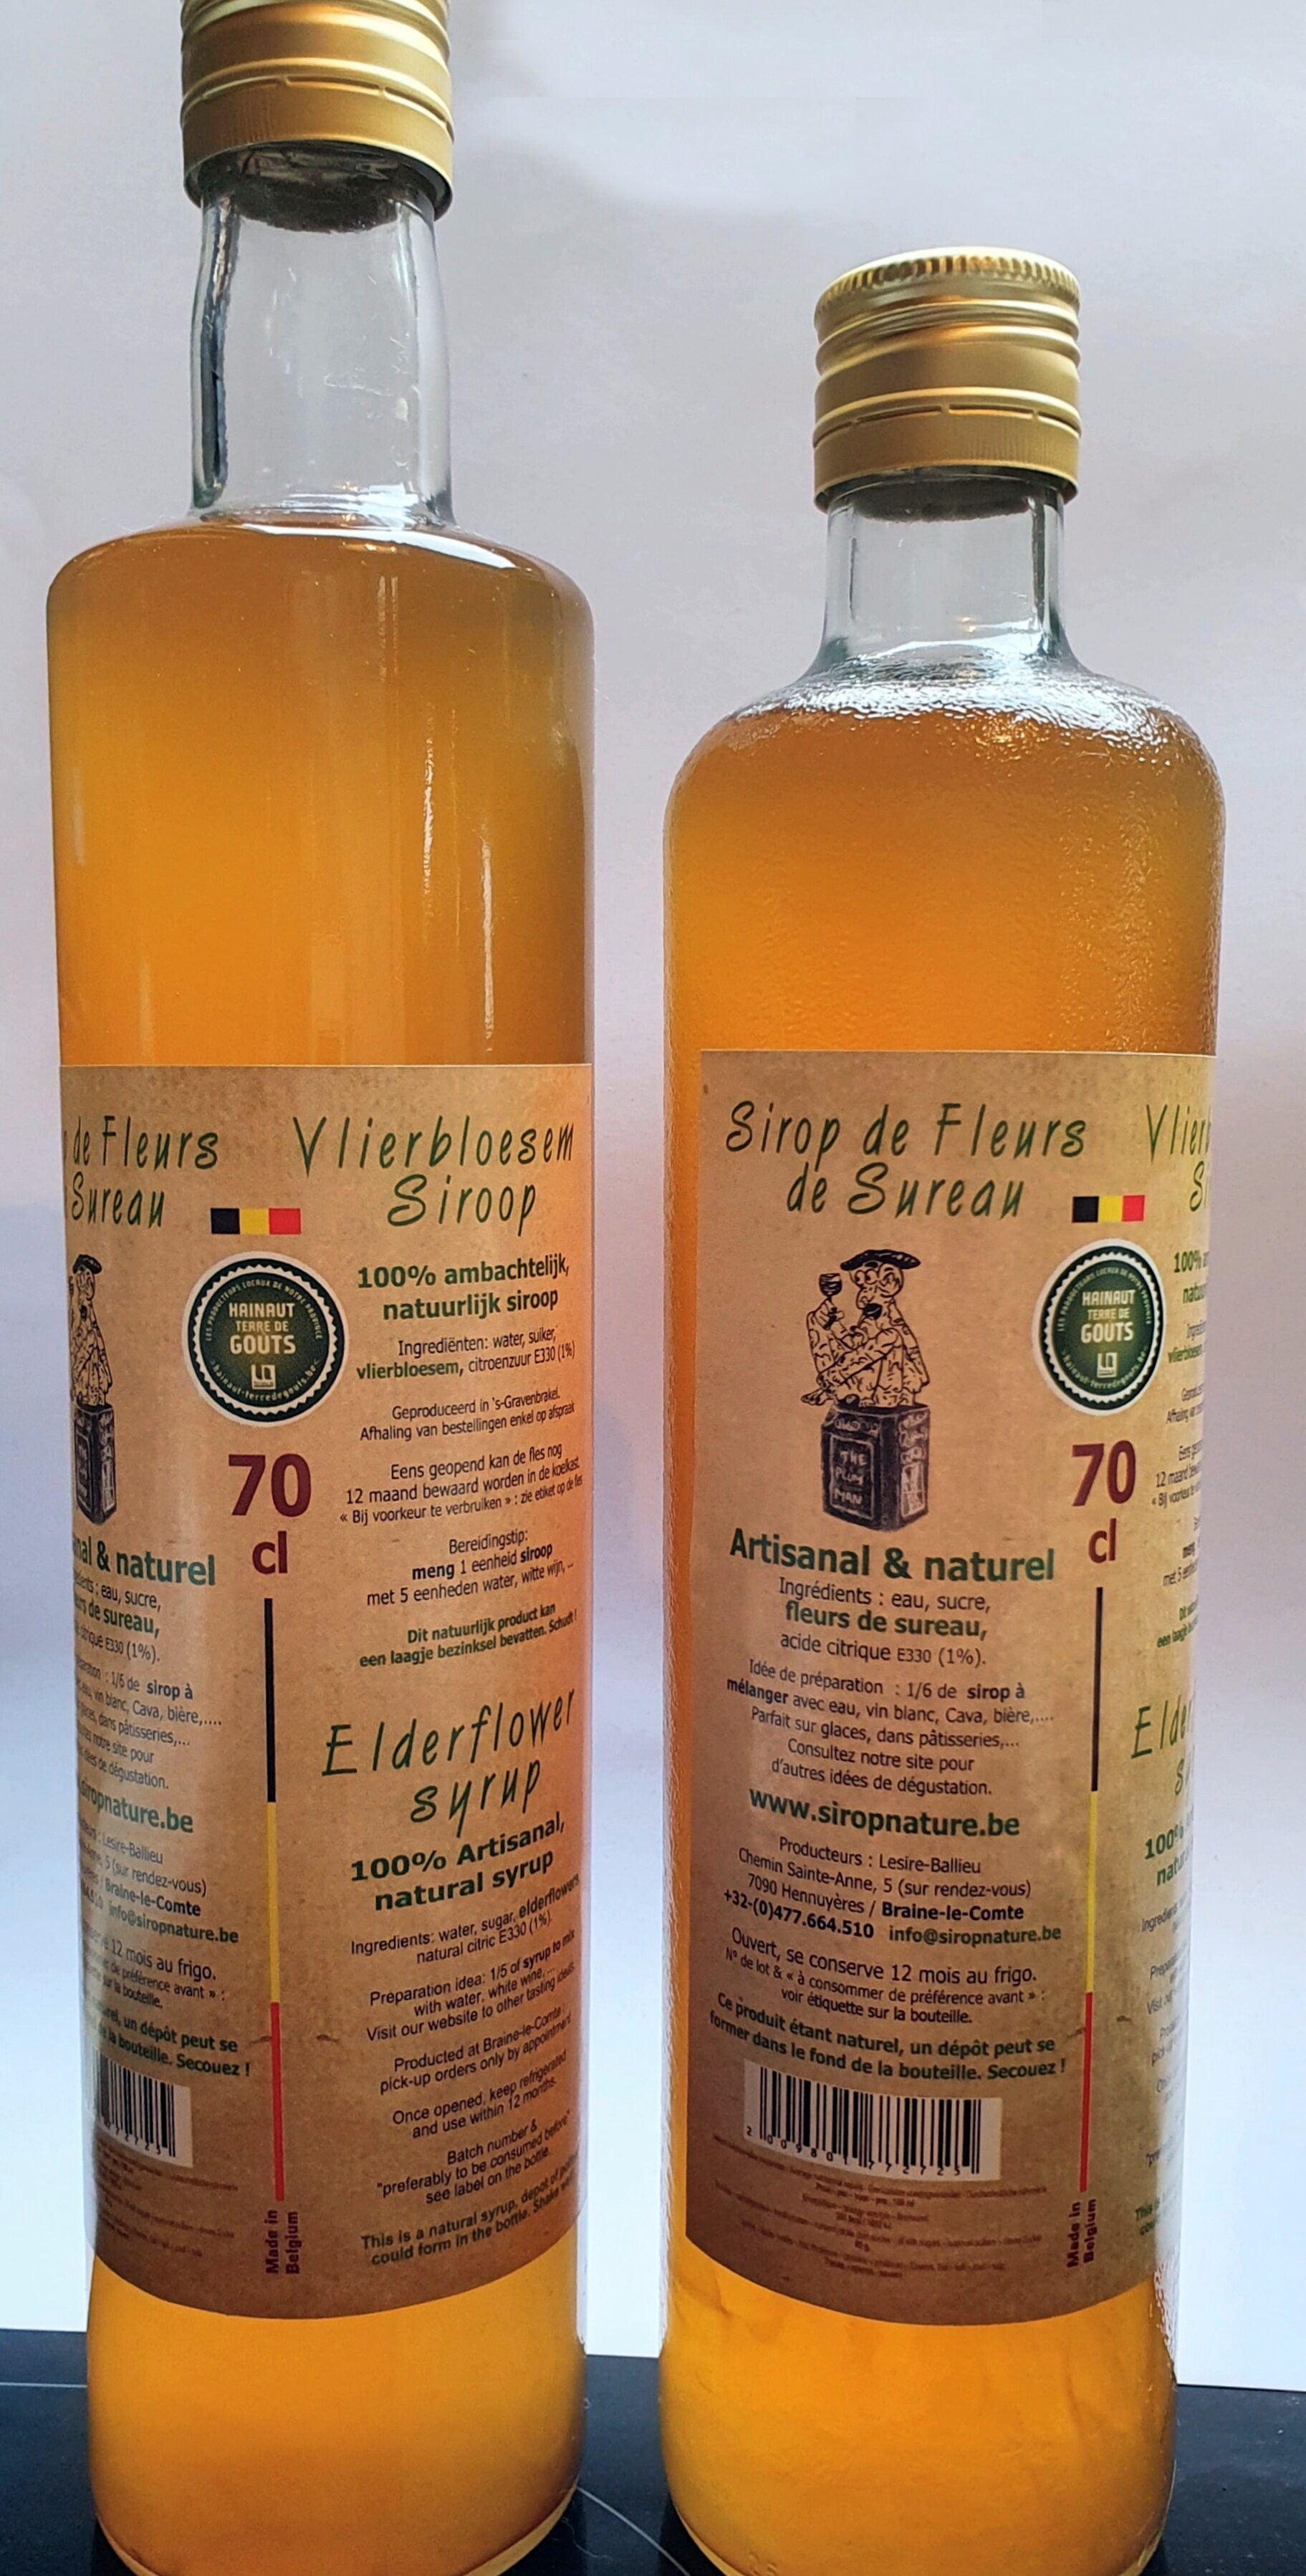 Sirop de fleurs de sureau - Product - fr